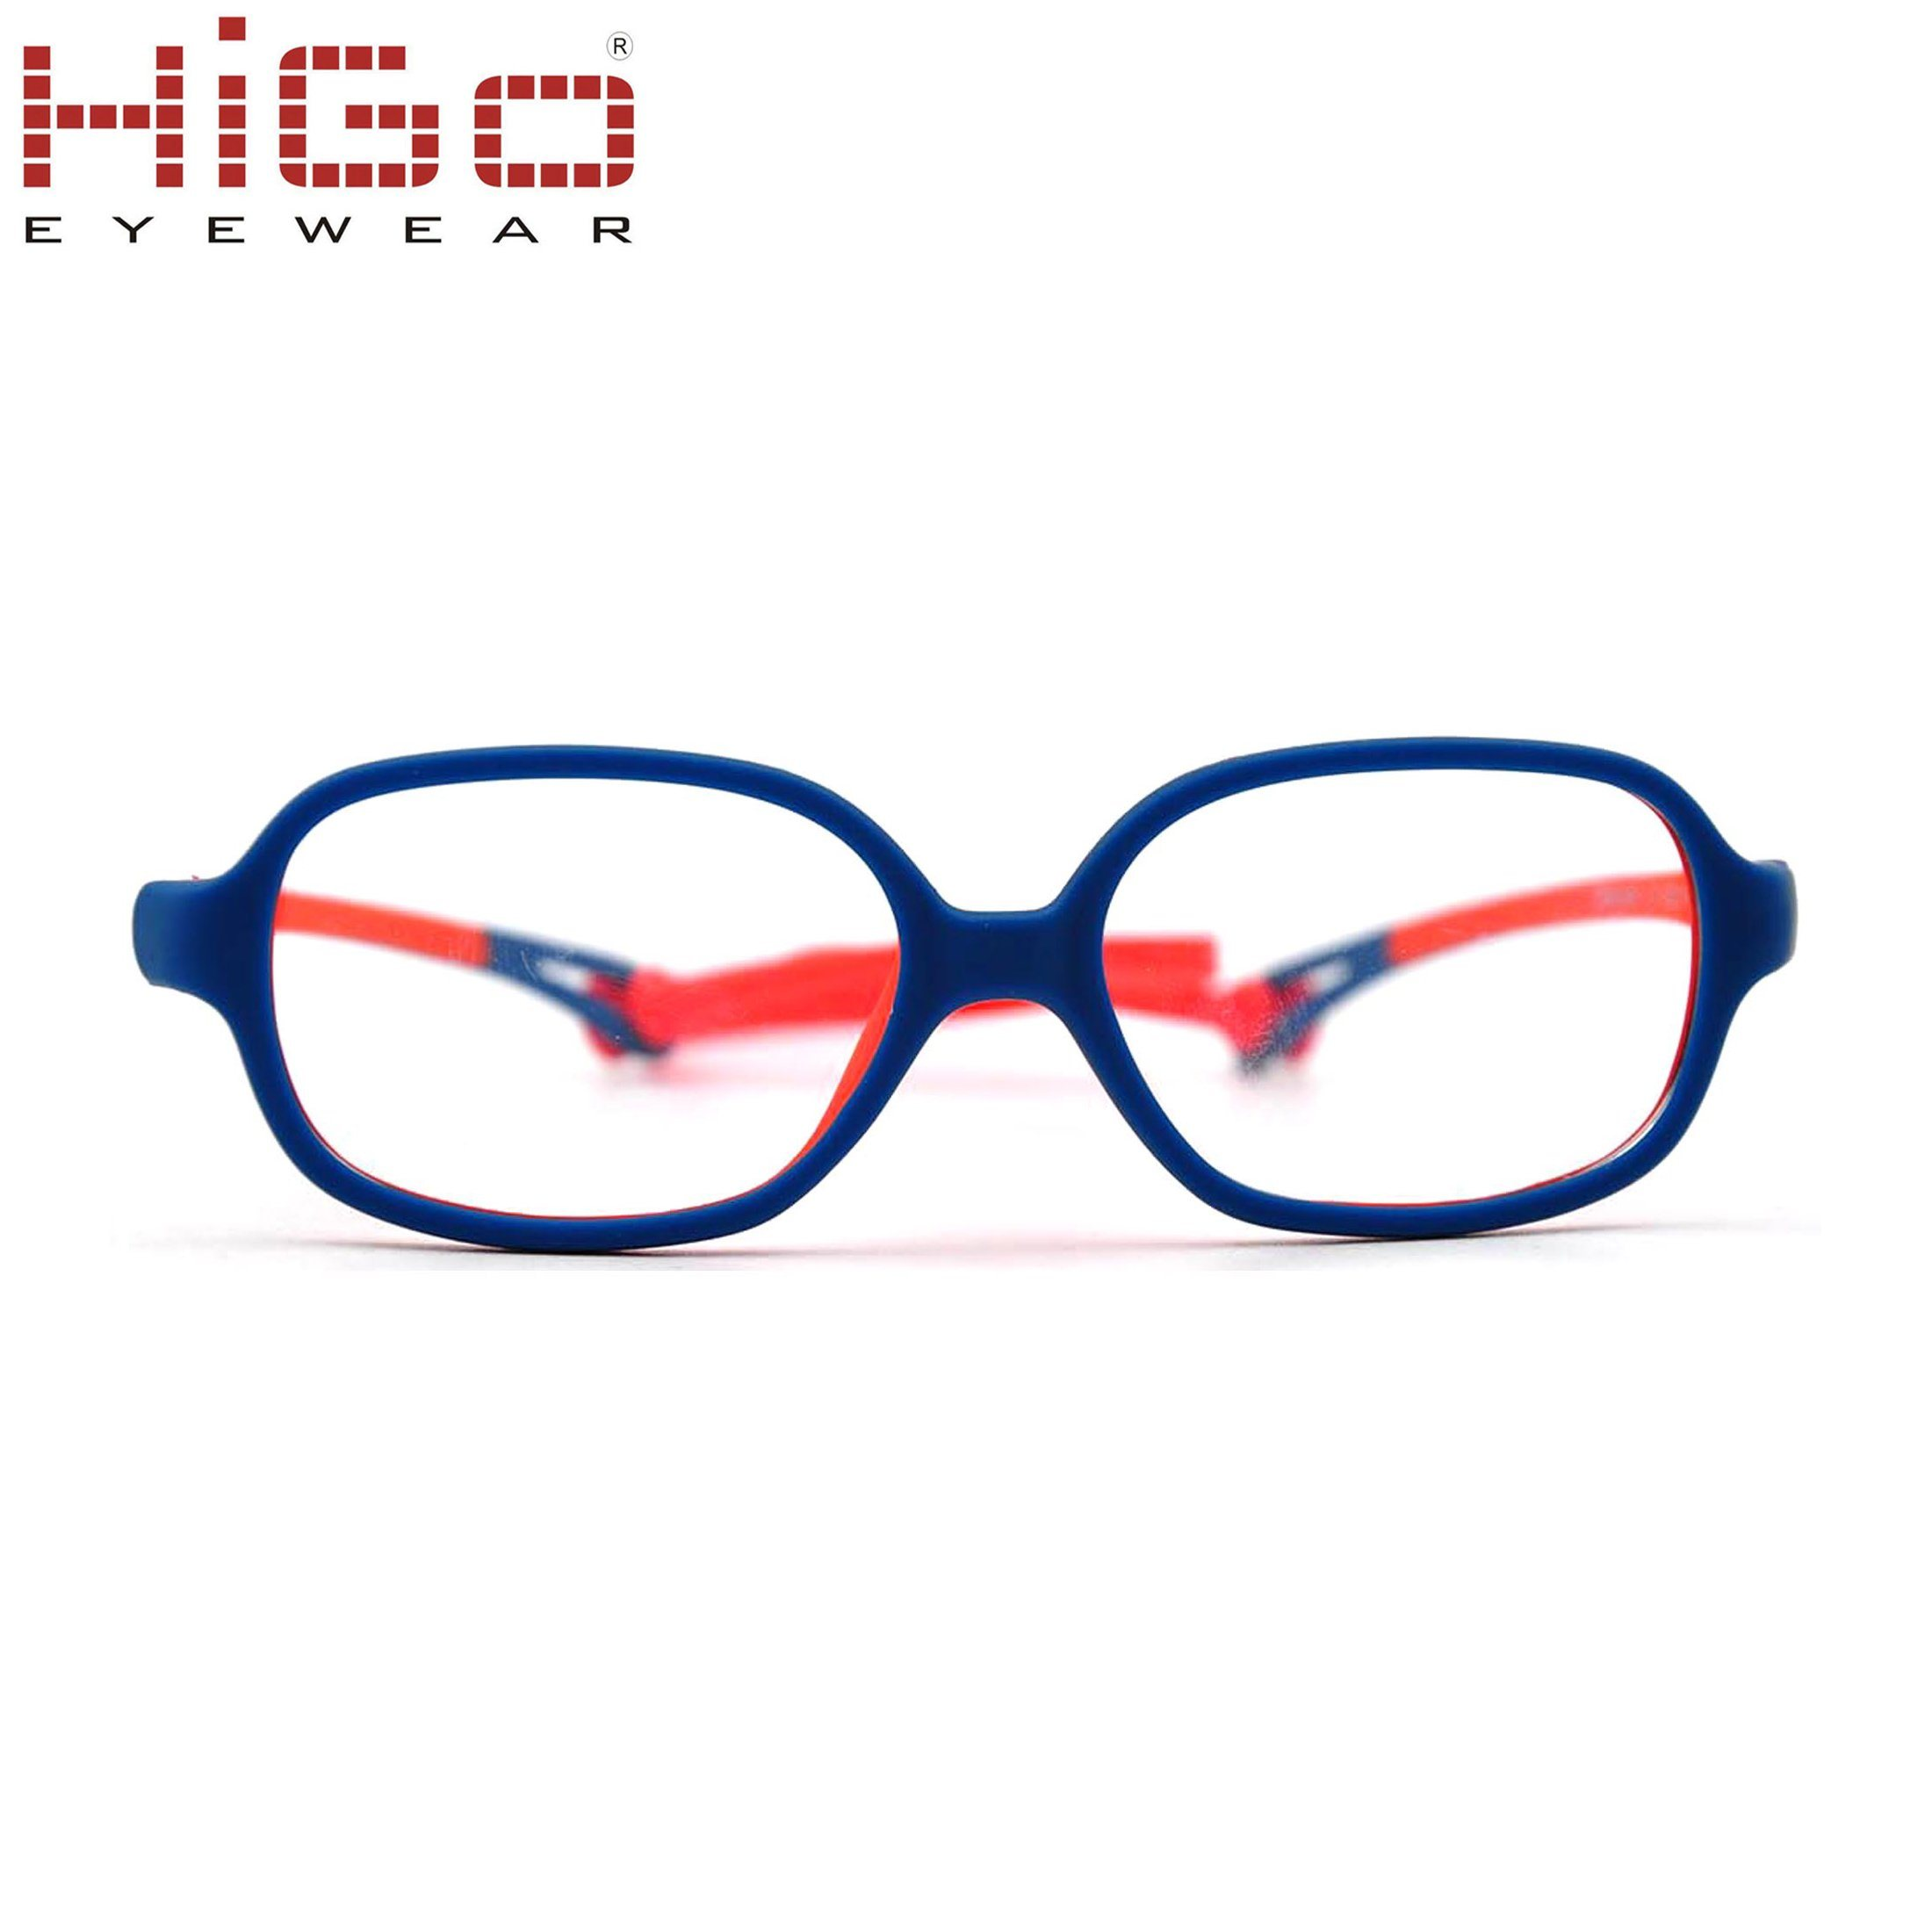 aba726c1380 China Higo Wholesale Tr90 Children Glasses Tr90 Kids Eyeglasses Frames  Online Shipping - China Kids Eyeglasses Frames